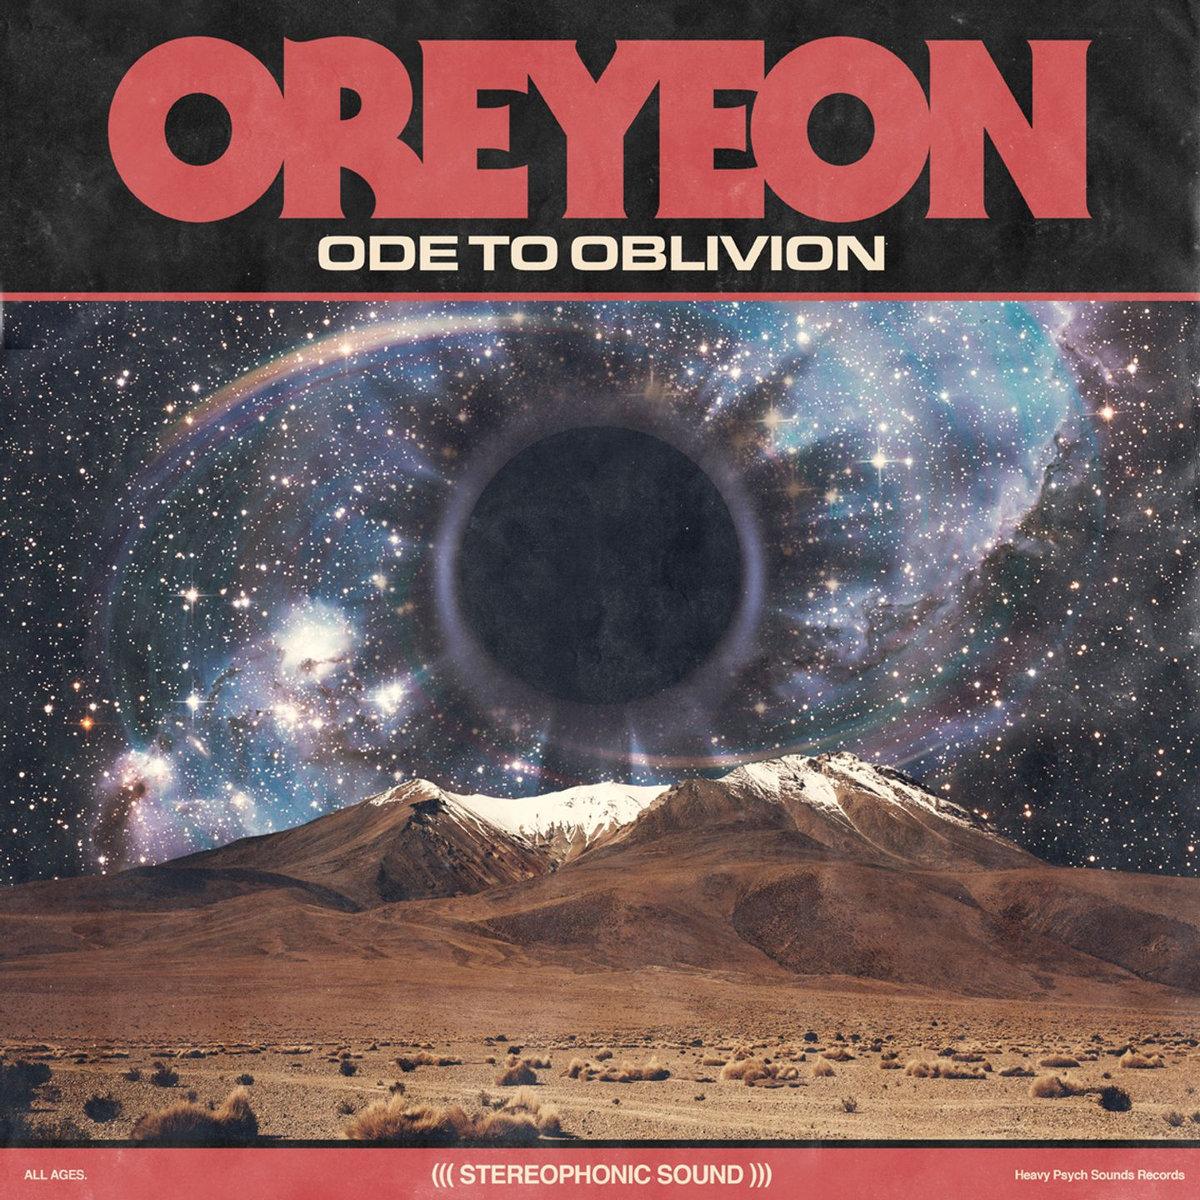 Oreyeon Ode to Oblivion